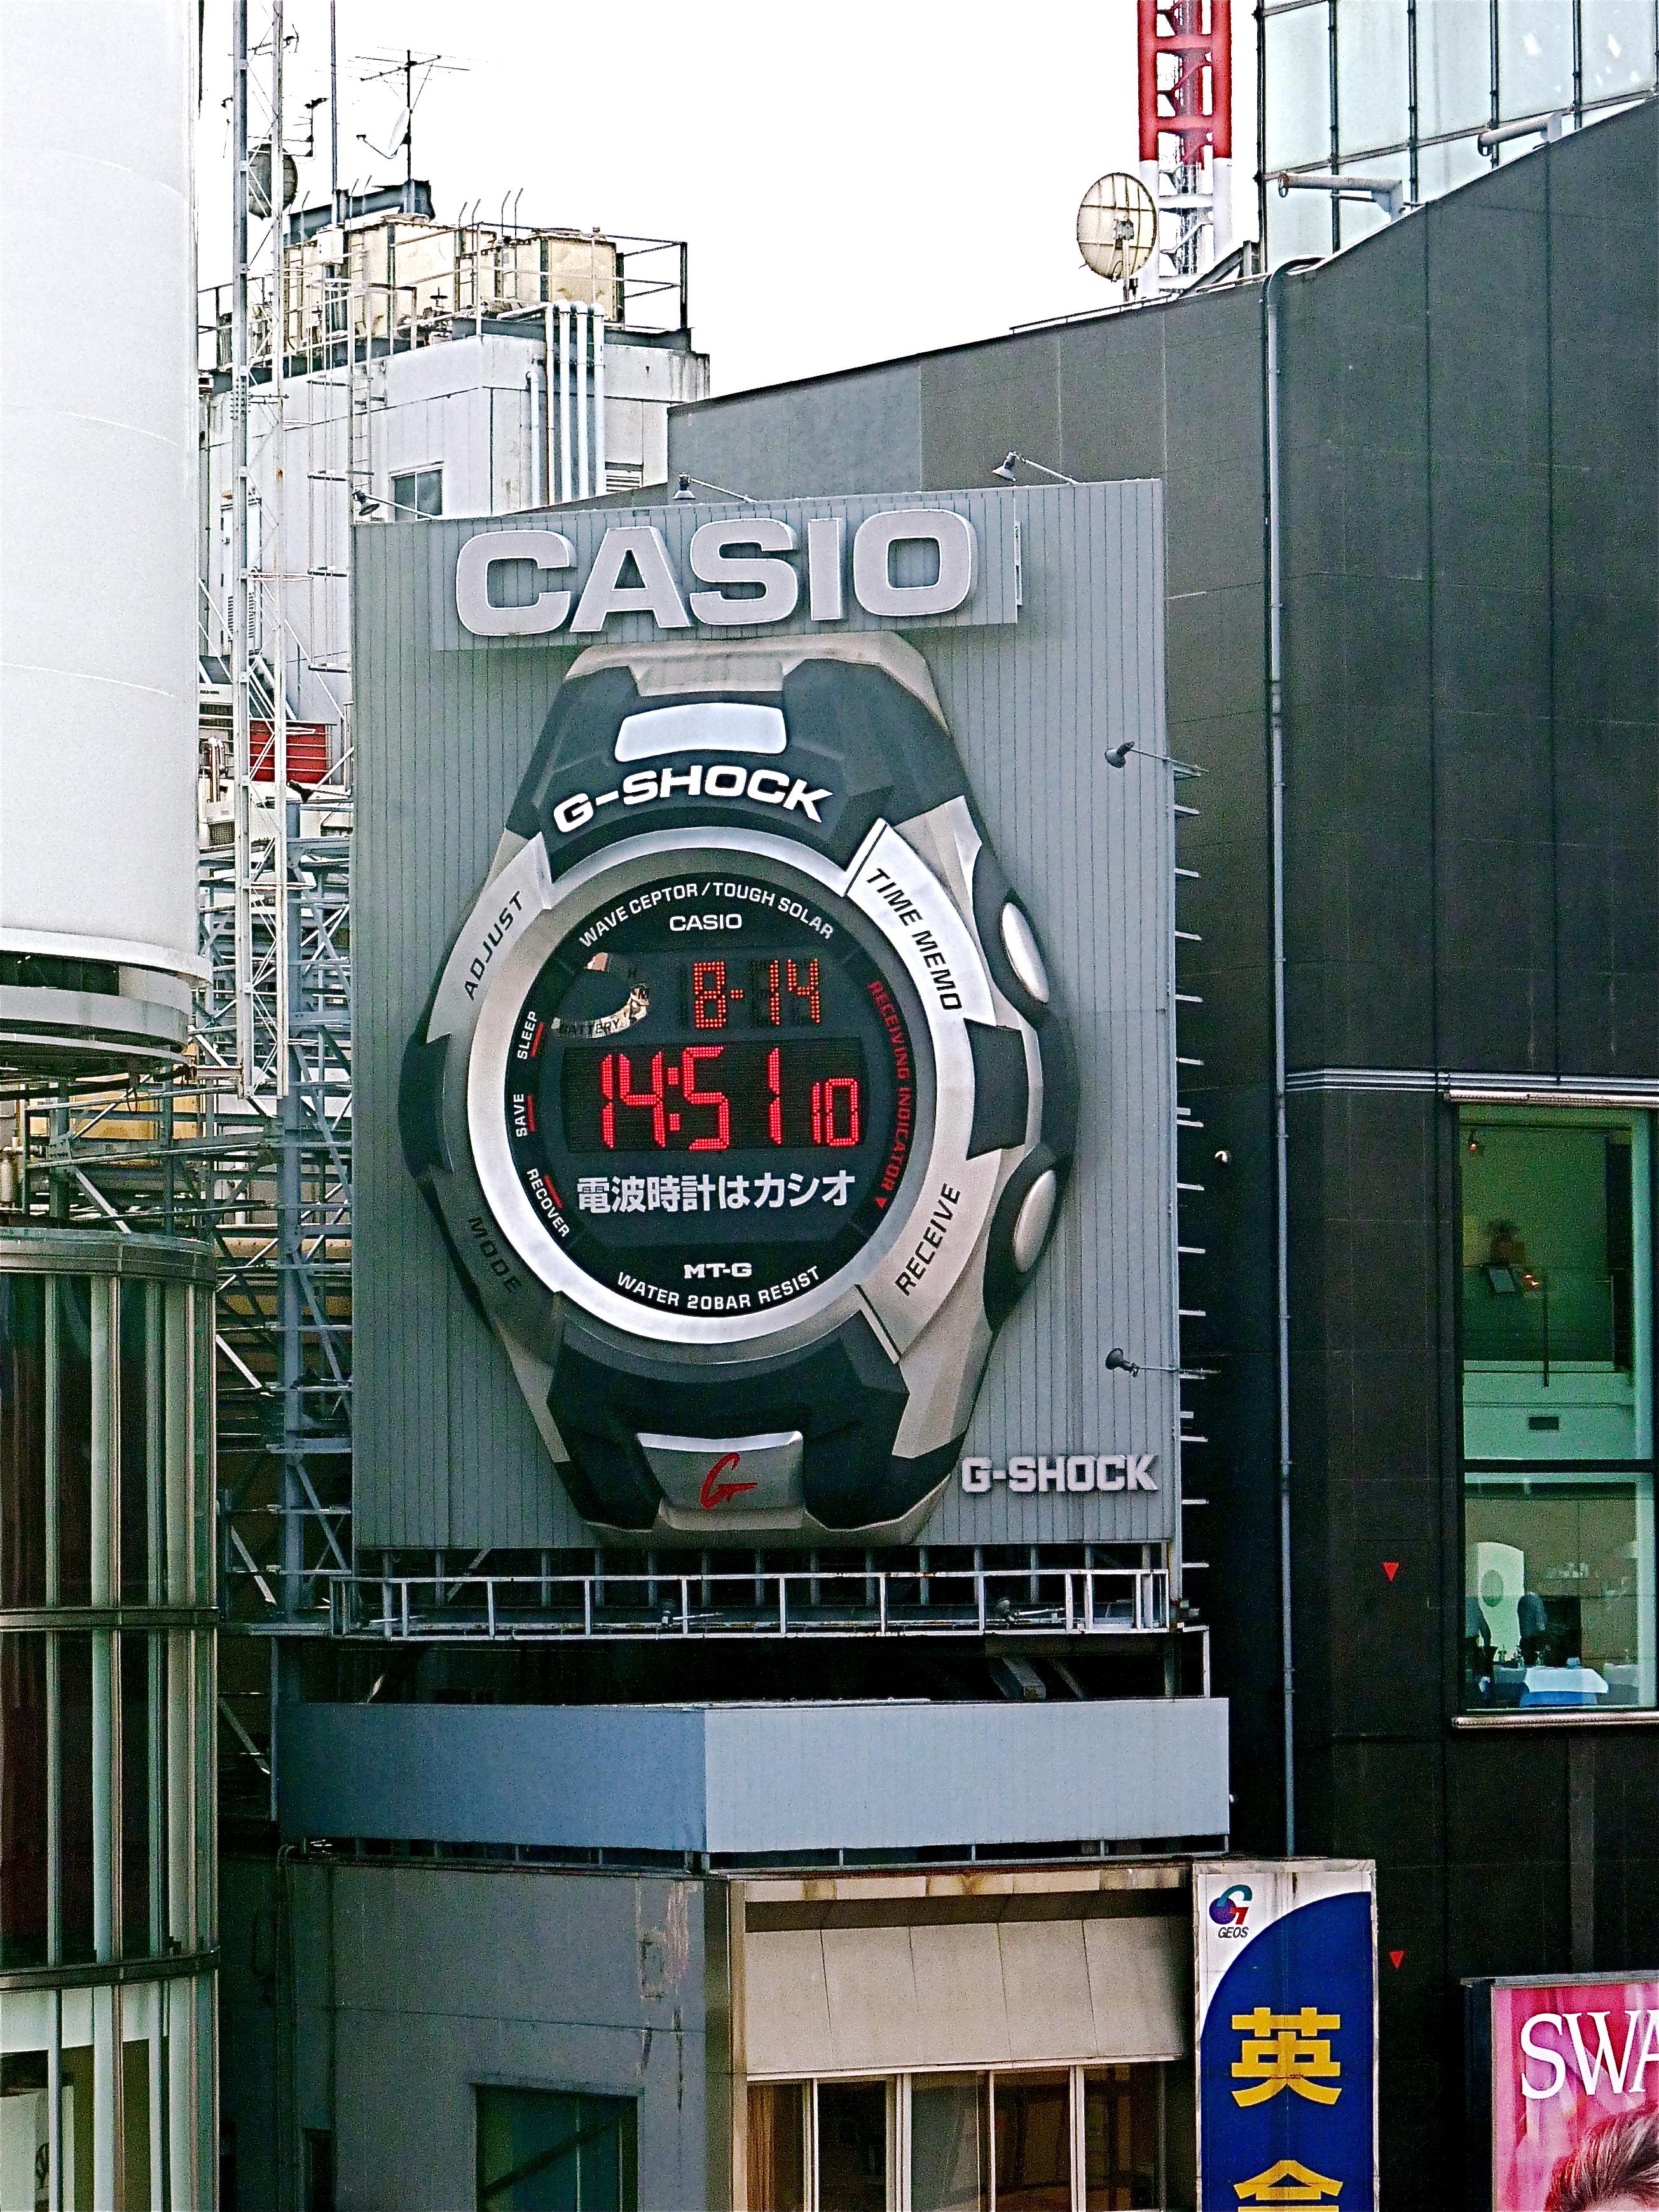 662ece8e1142 File CASIO Giant G-SHOCK in Ginza 2009.jpg - Wikimedia Commons